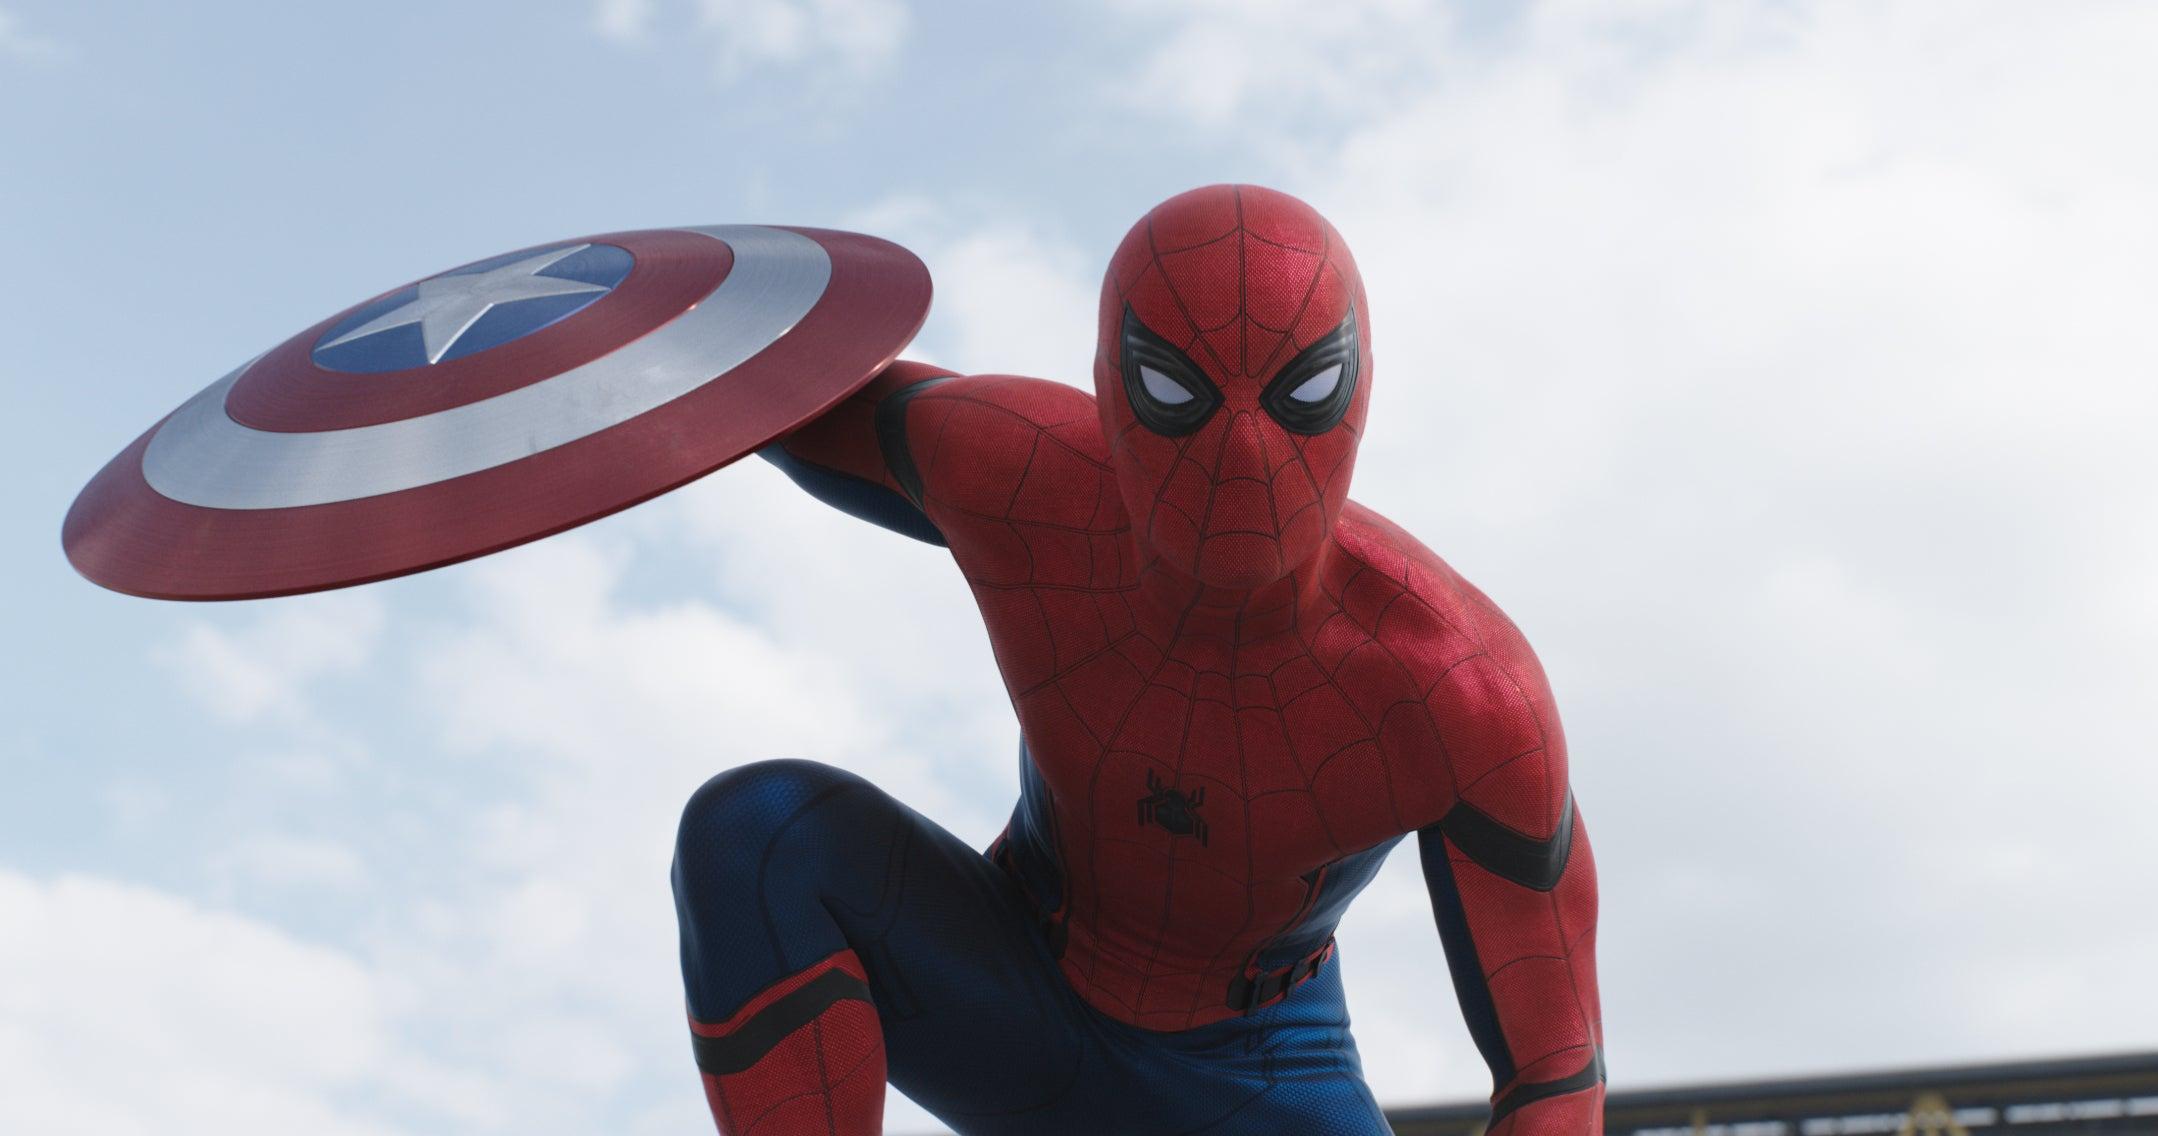 Captain America : Civil War [Marvel - 2016] - Page 12 Ggkqttuhz5tyo9zvlcwi